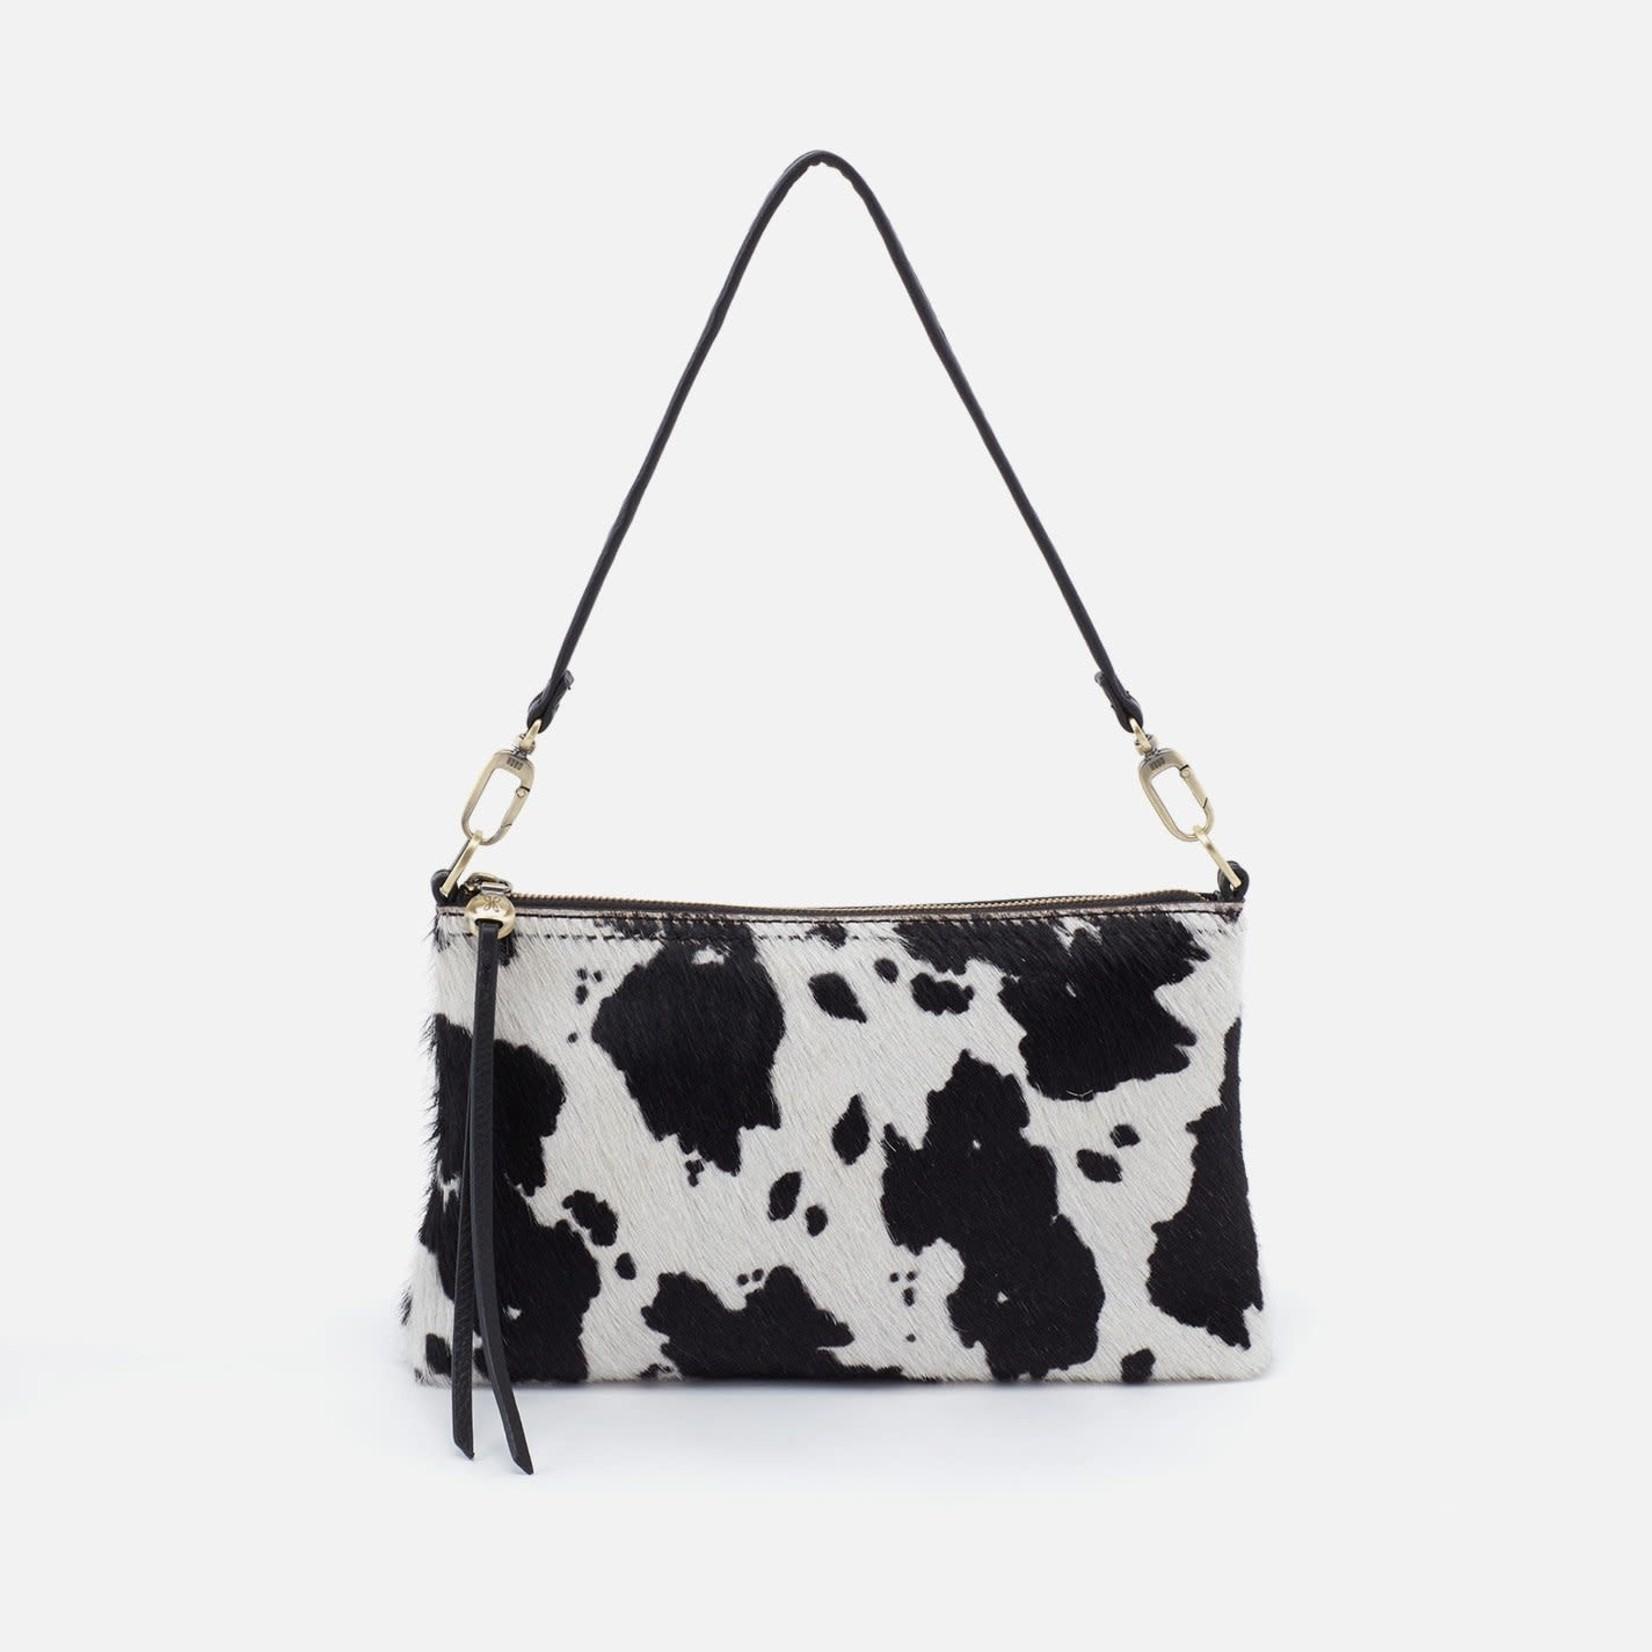 HOBO Darcy Cow Blk/Wht Leather Wristlet/Crossbody